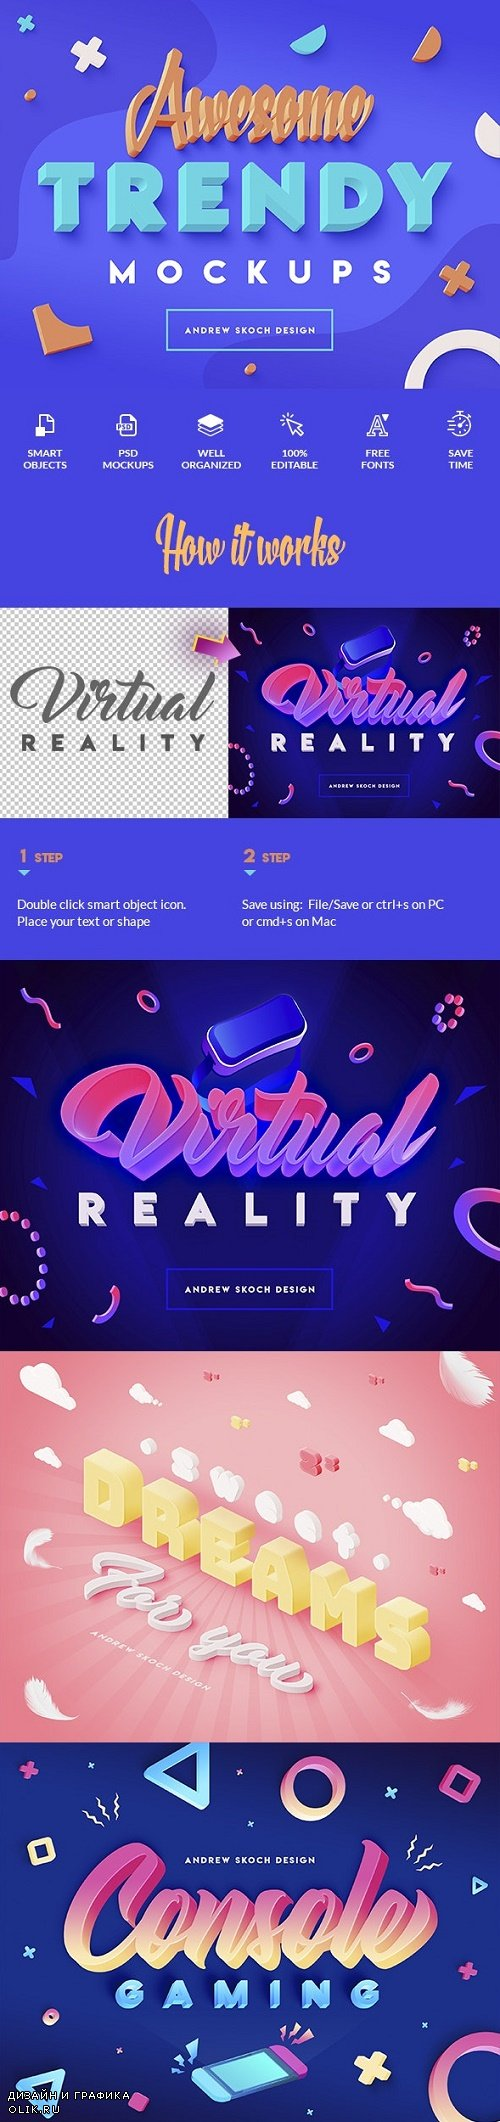 Vibrant 3D Text Effects - 24100639